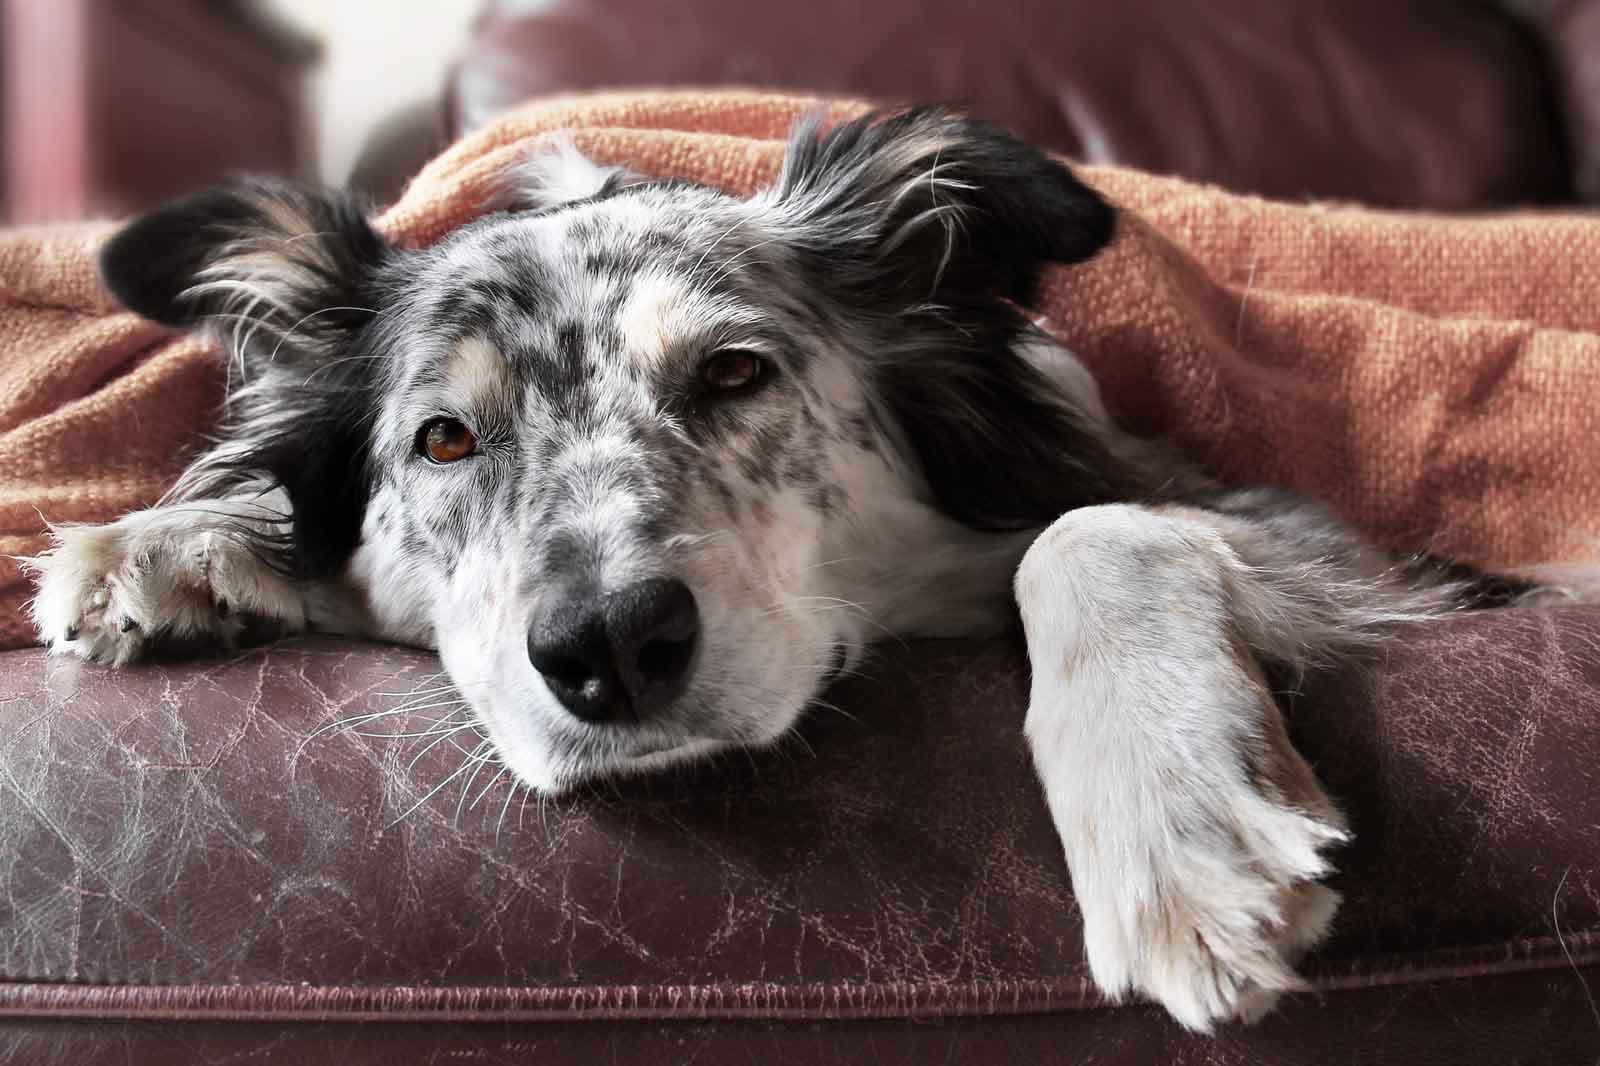 У собаки температура: какие части тела питомца помогут определить жар